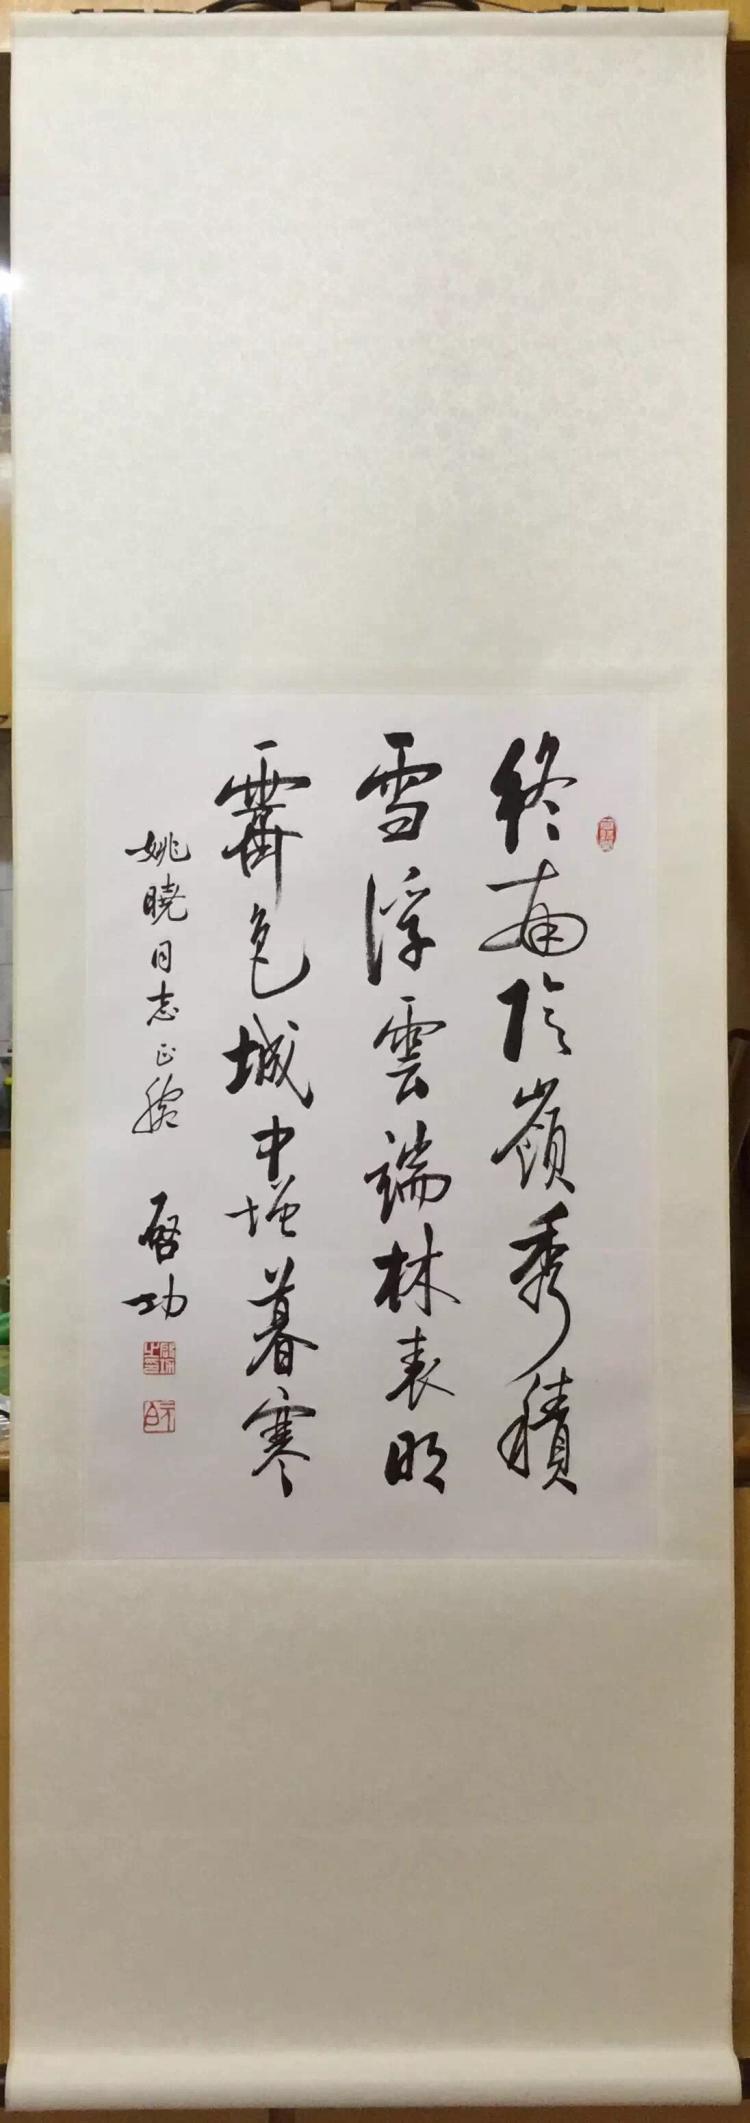 Qi Gong  (1912-2005), Calligraphy